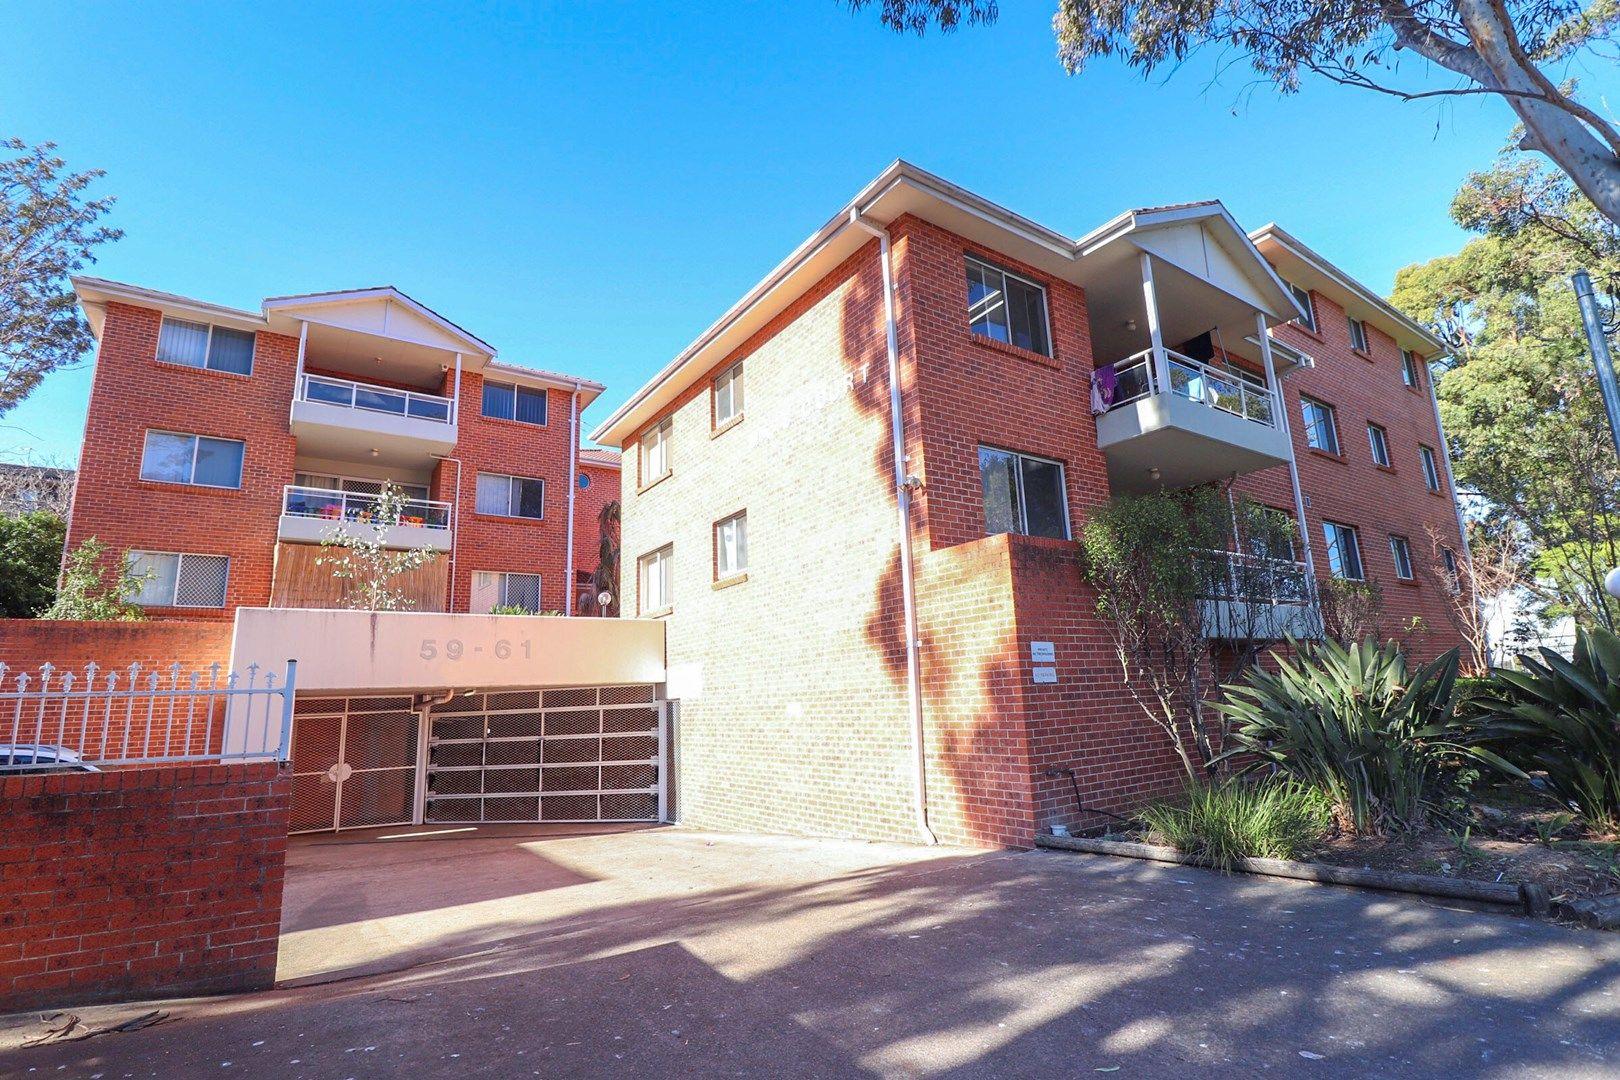 5/59-61 Brancourt Avenue, Bankstown NSW 2200, Image 0